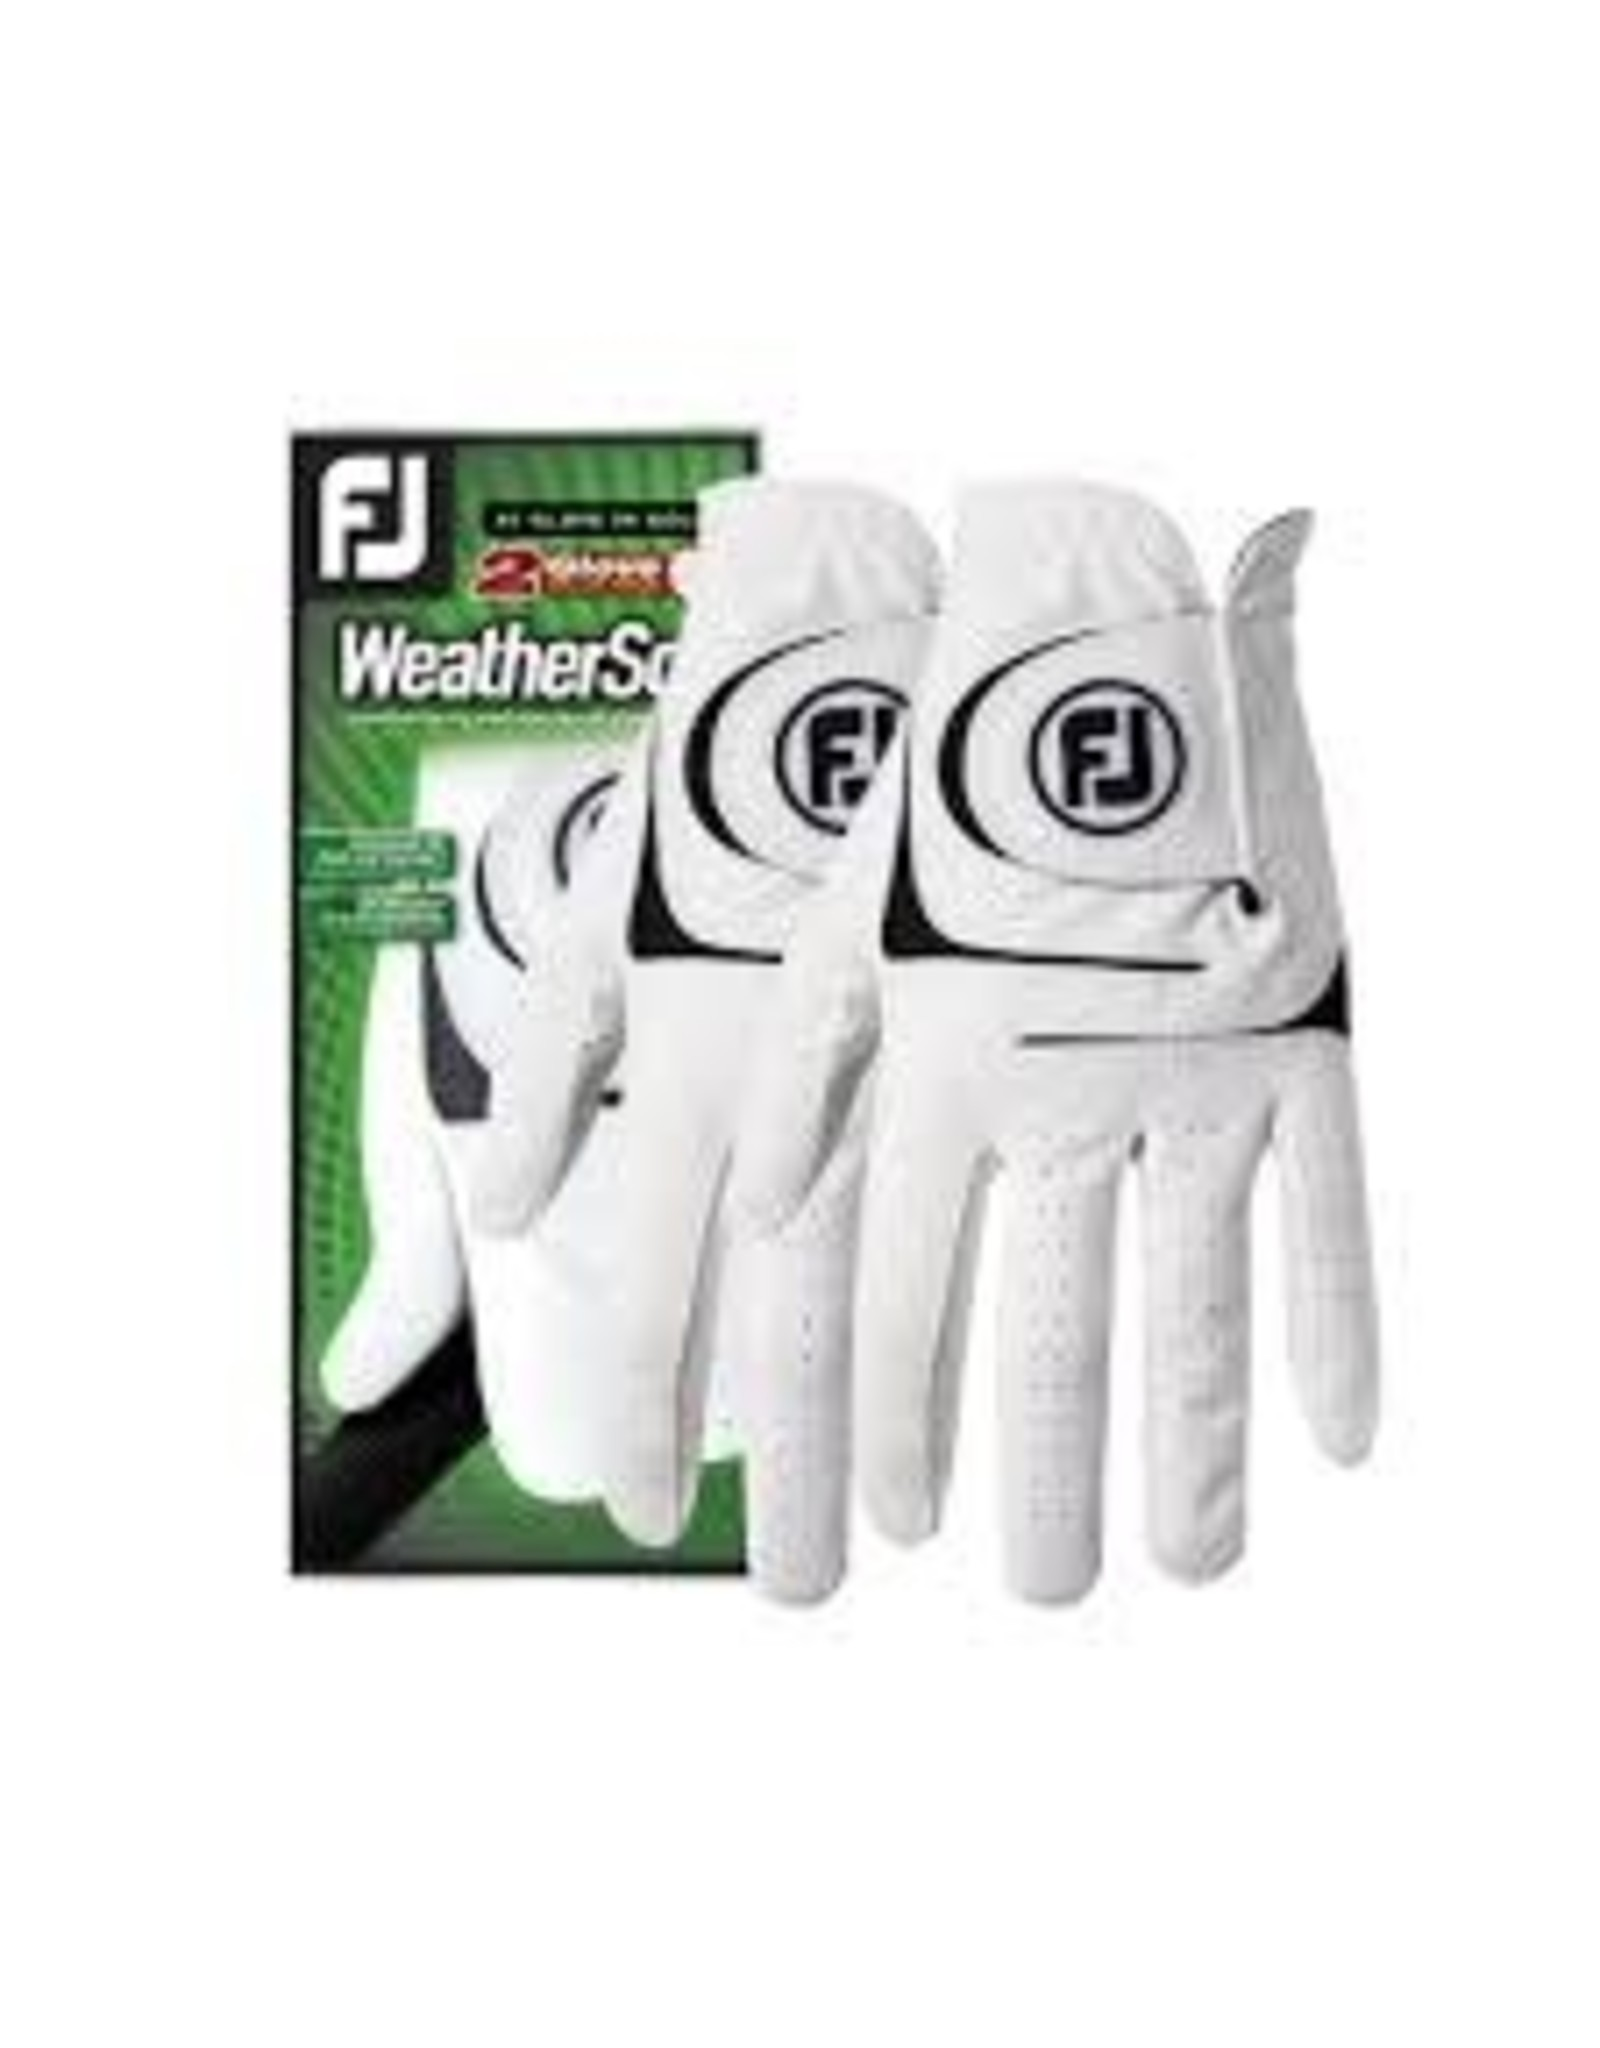 Acushnet FJ Mens 2PK Weathersof Glove